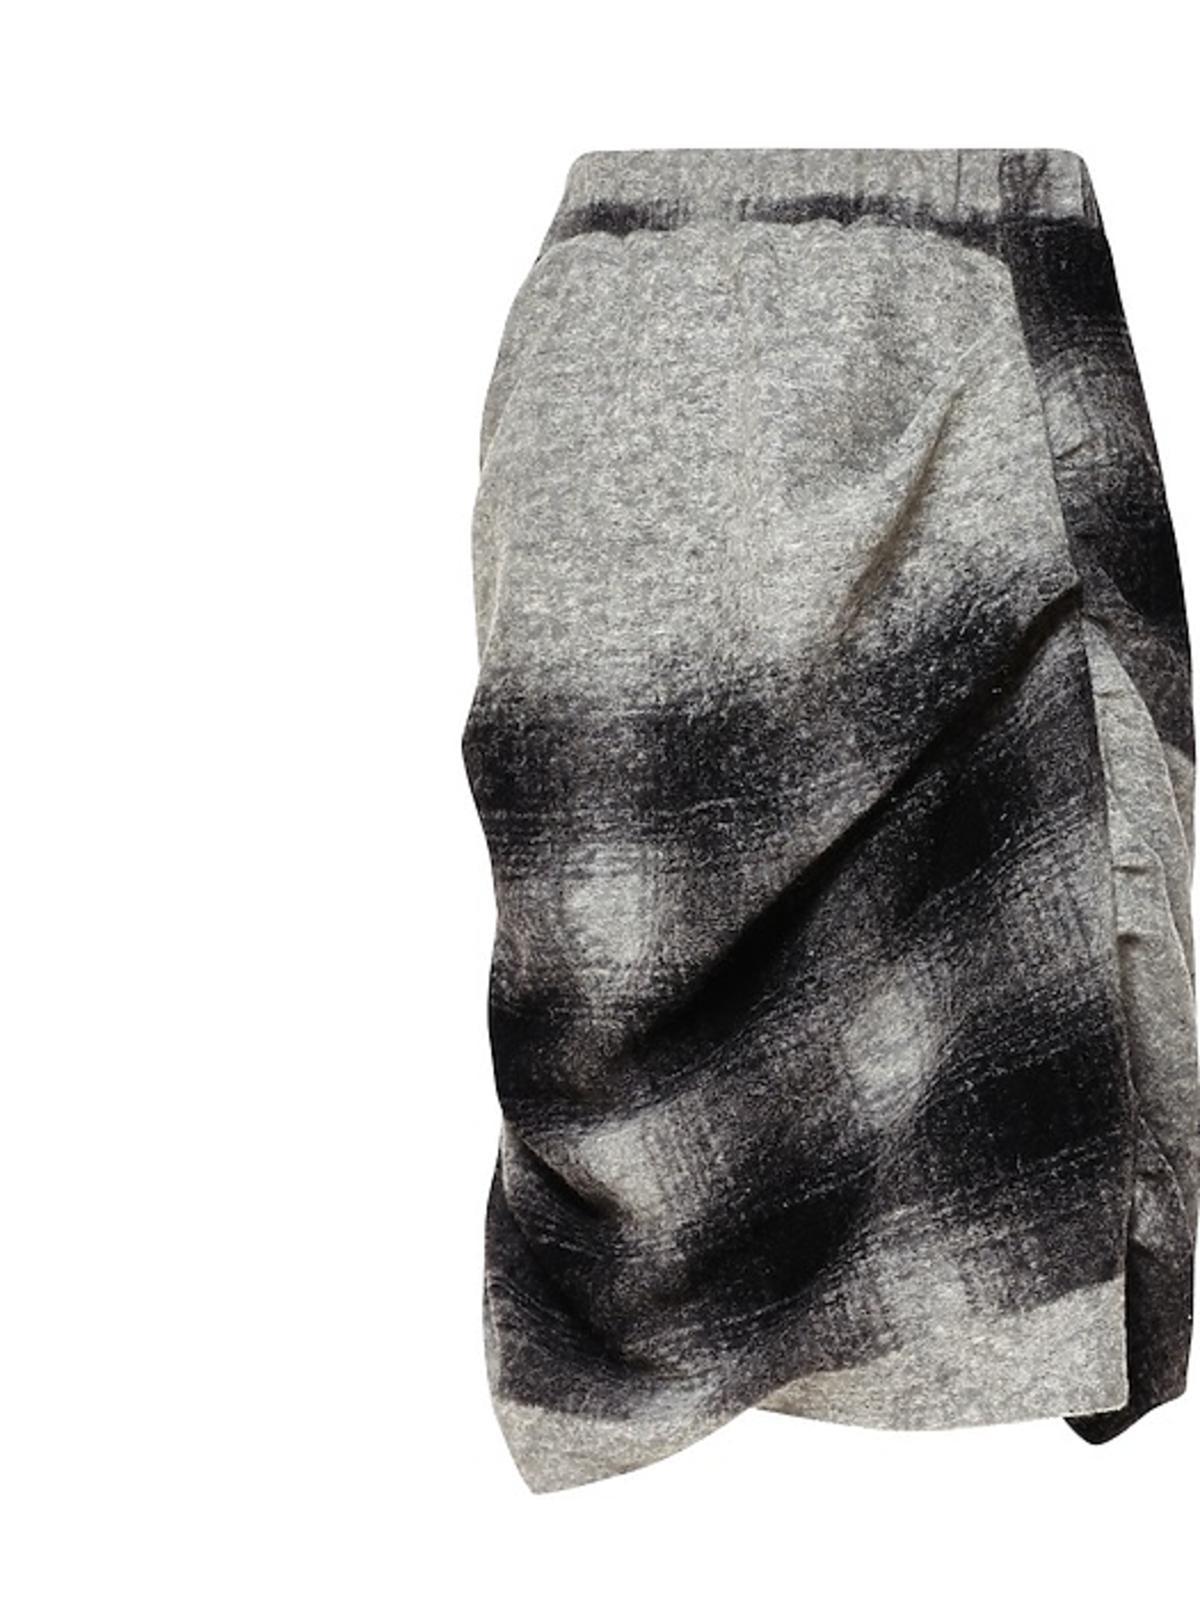 Spódnica Agi Jensen Design/Pakamera.pl, 480 zł